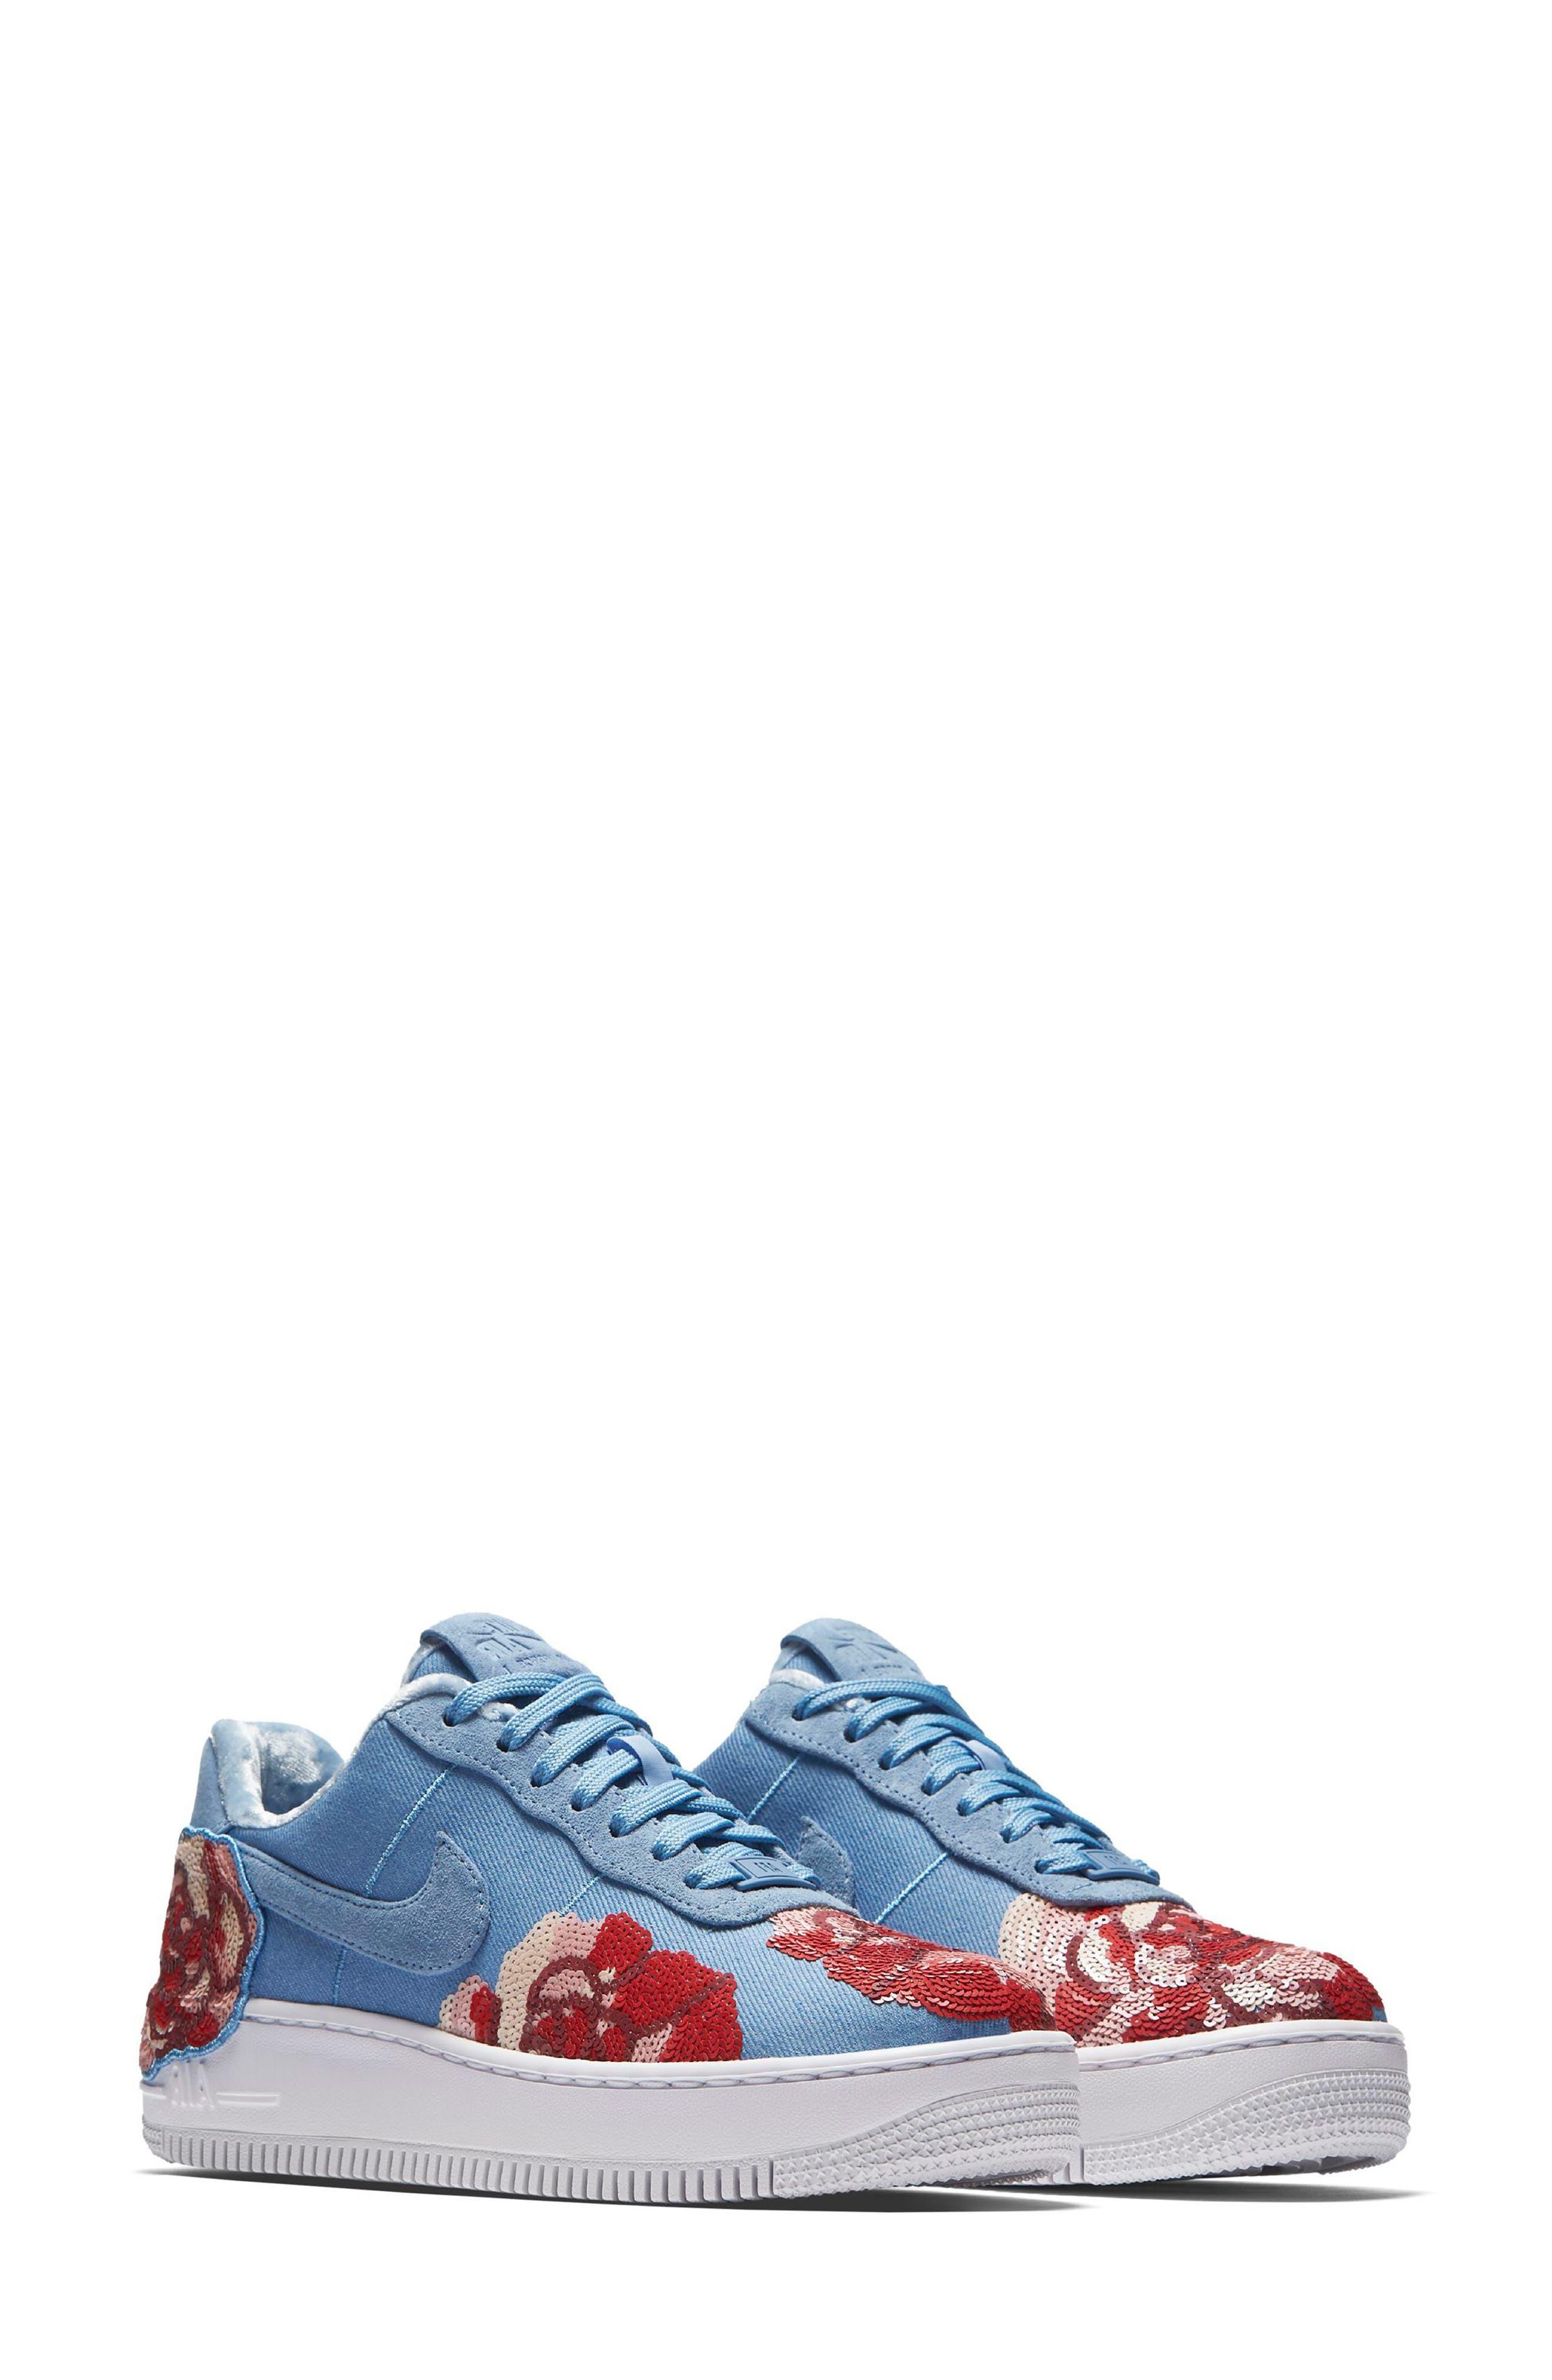 Alternate Image 1 Selected - Nike Women's Air Force 1 Upstep LX Shoe (Women)